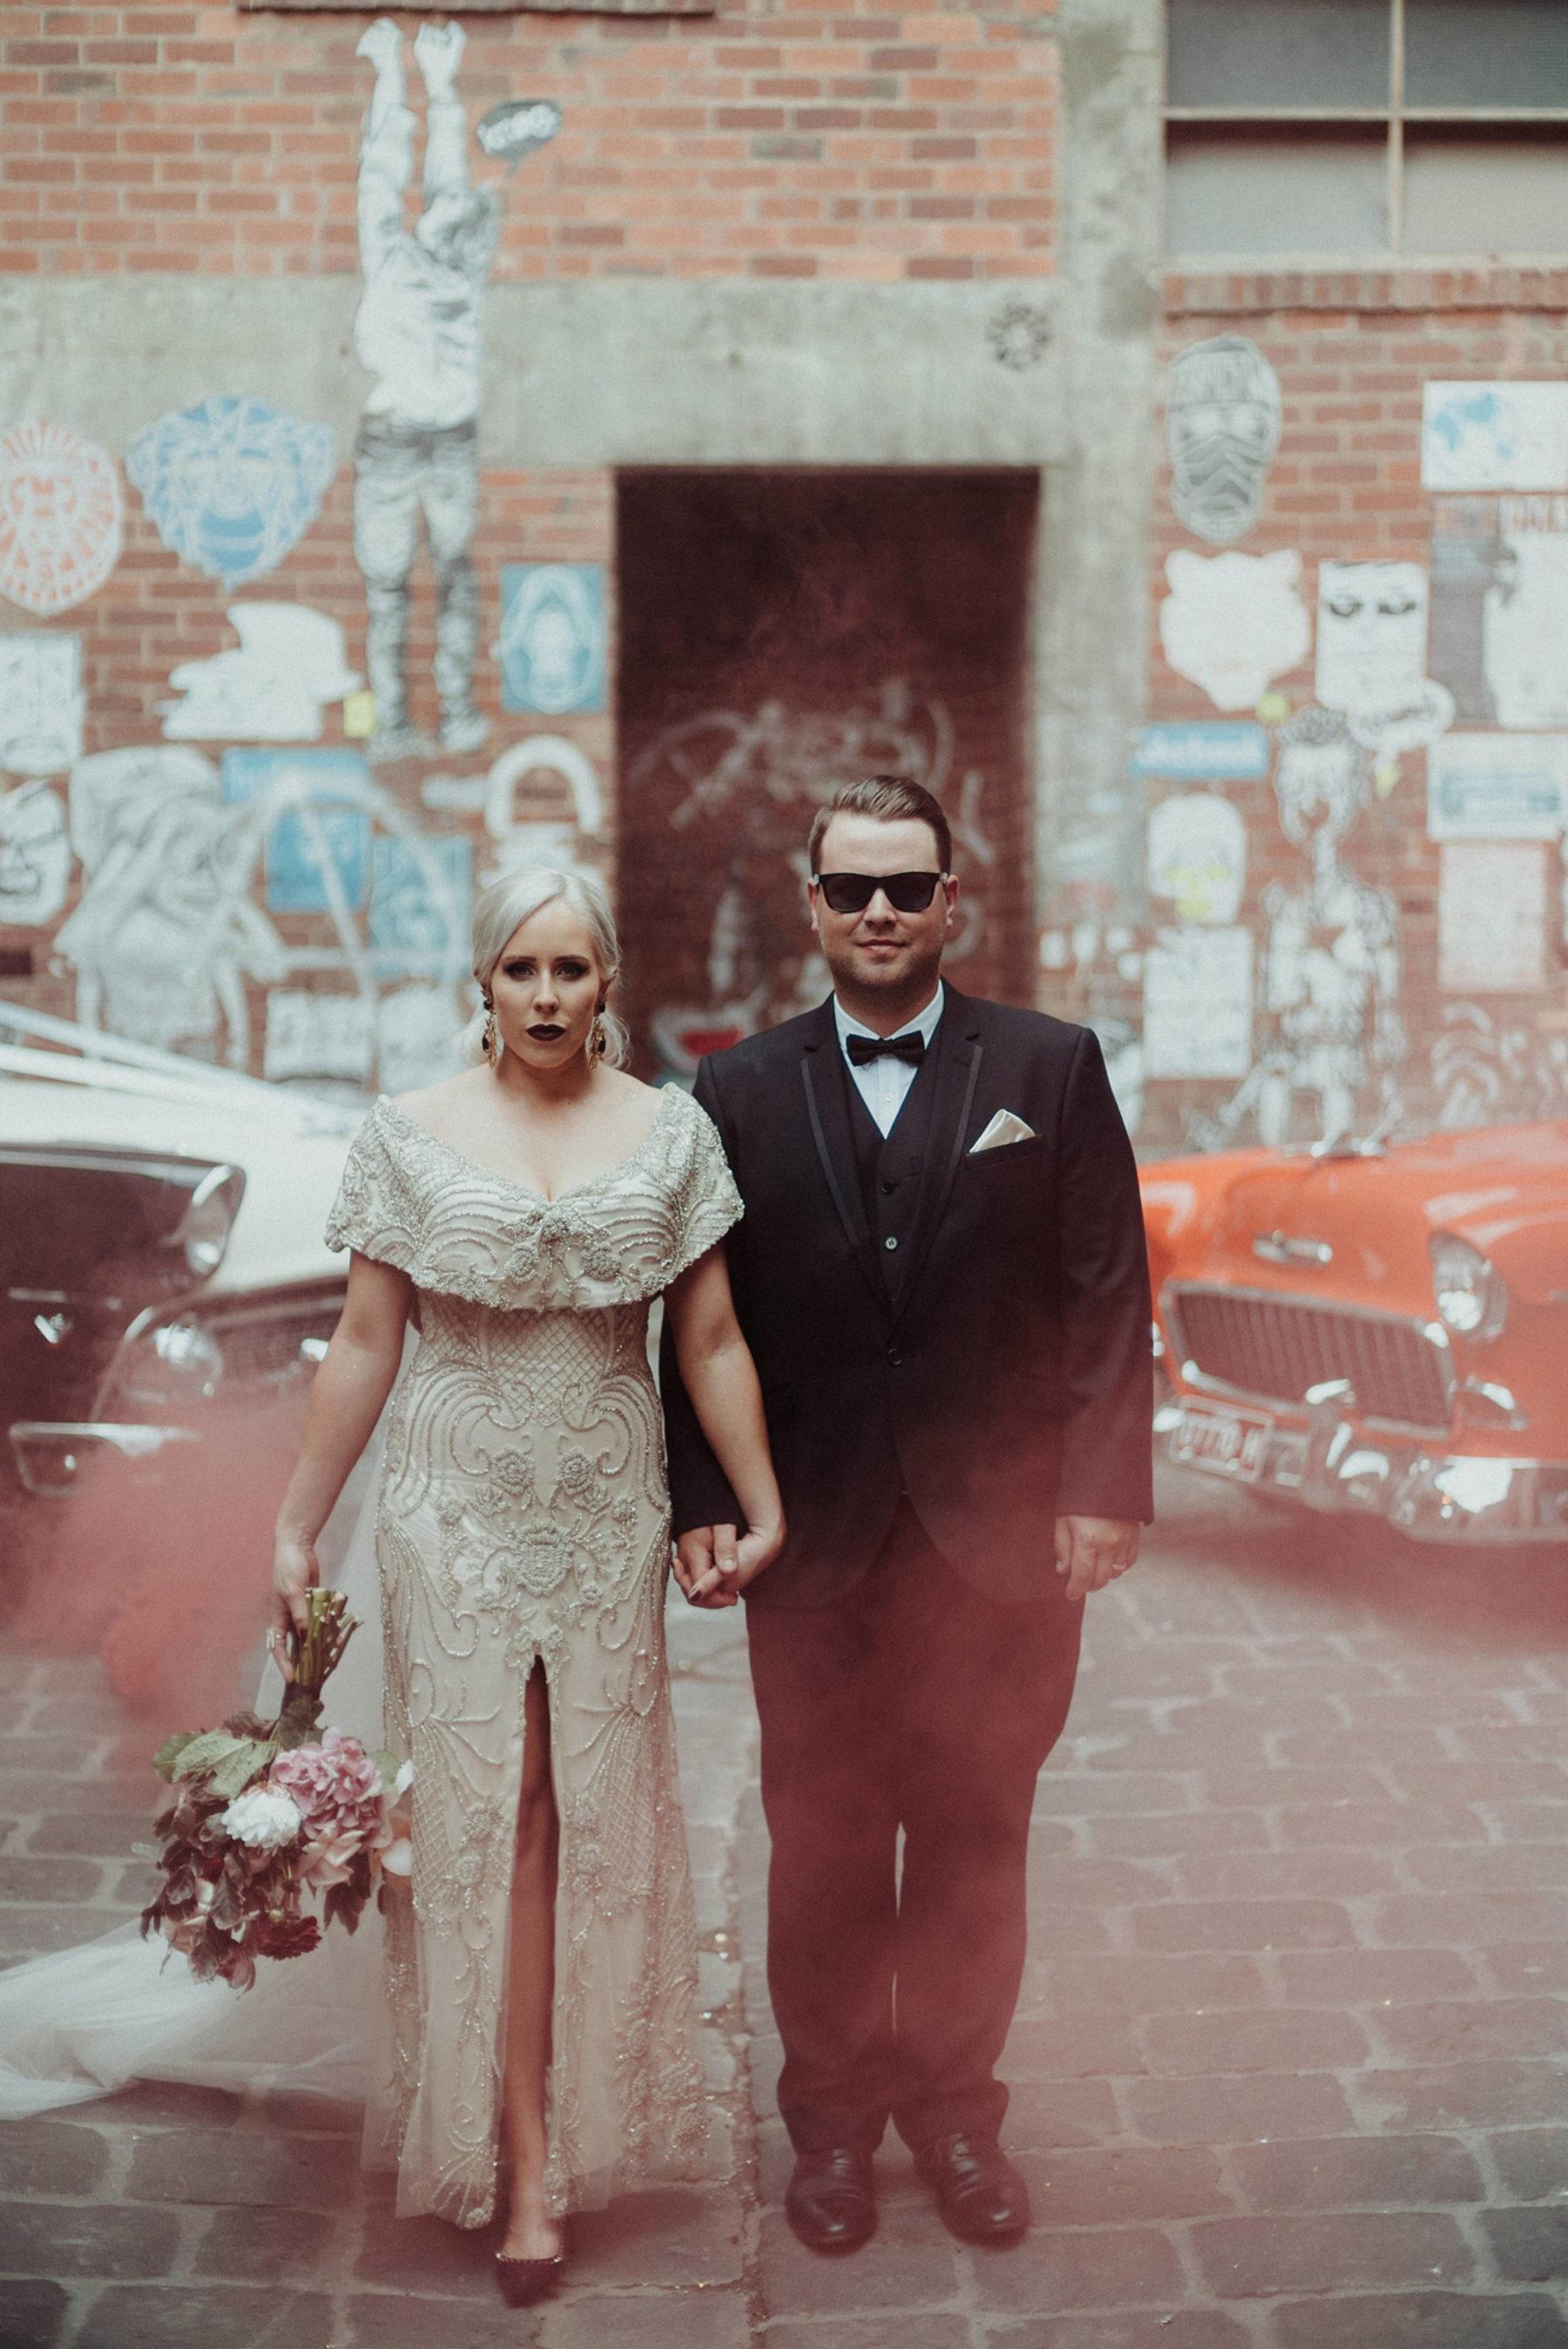 bang-bang-boogaloo-wedding-melbourne-17-1800x0-c-default.jpg